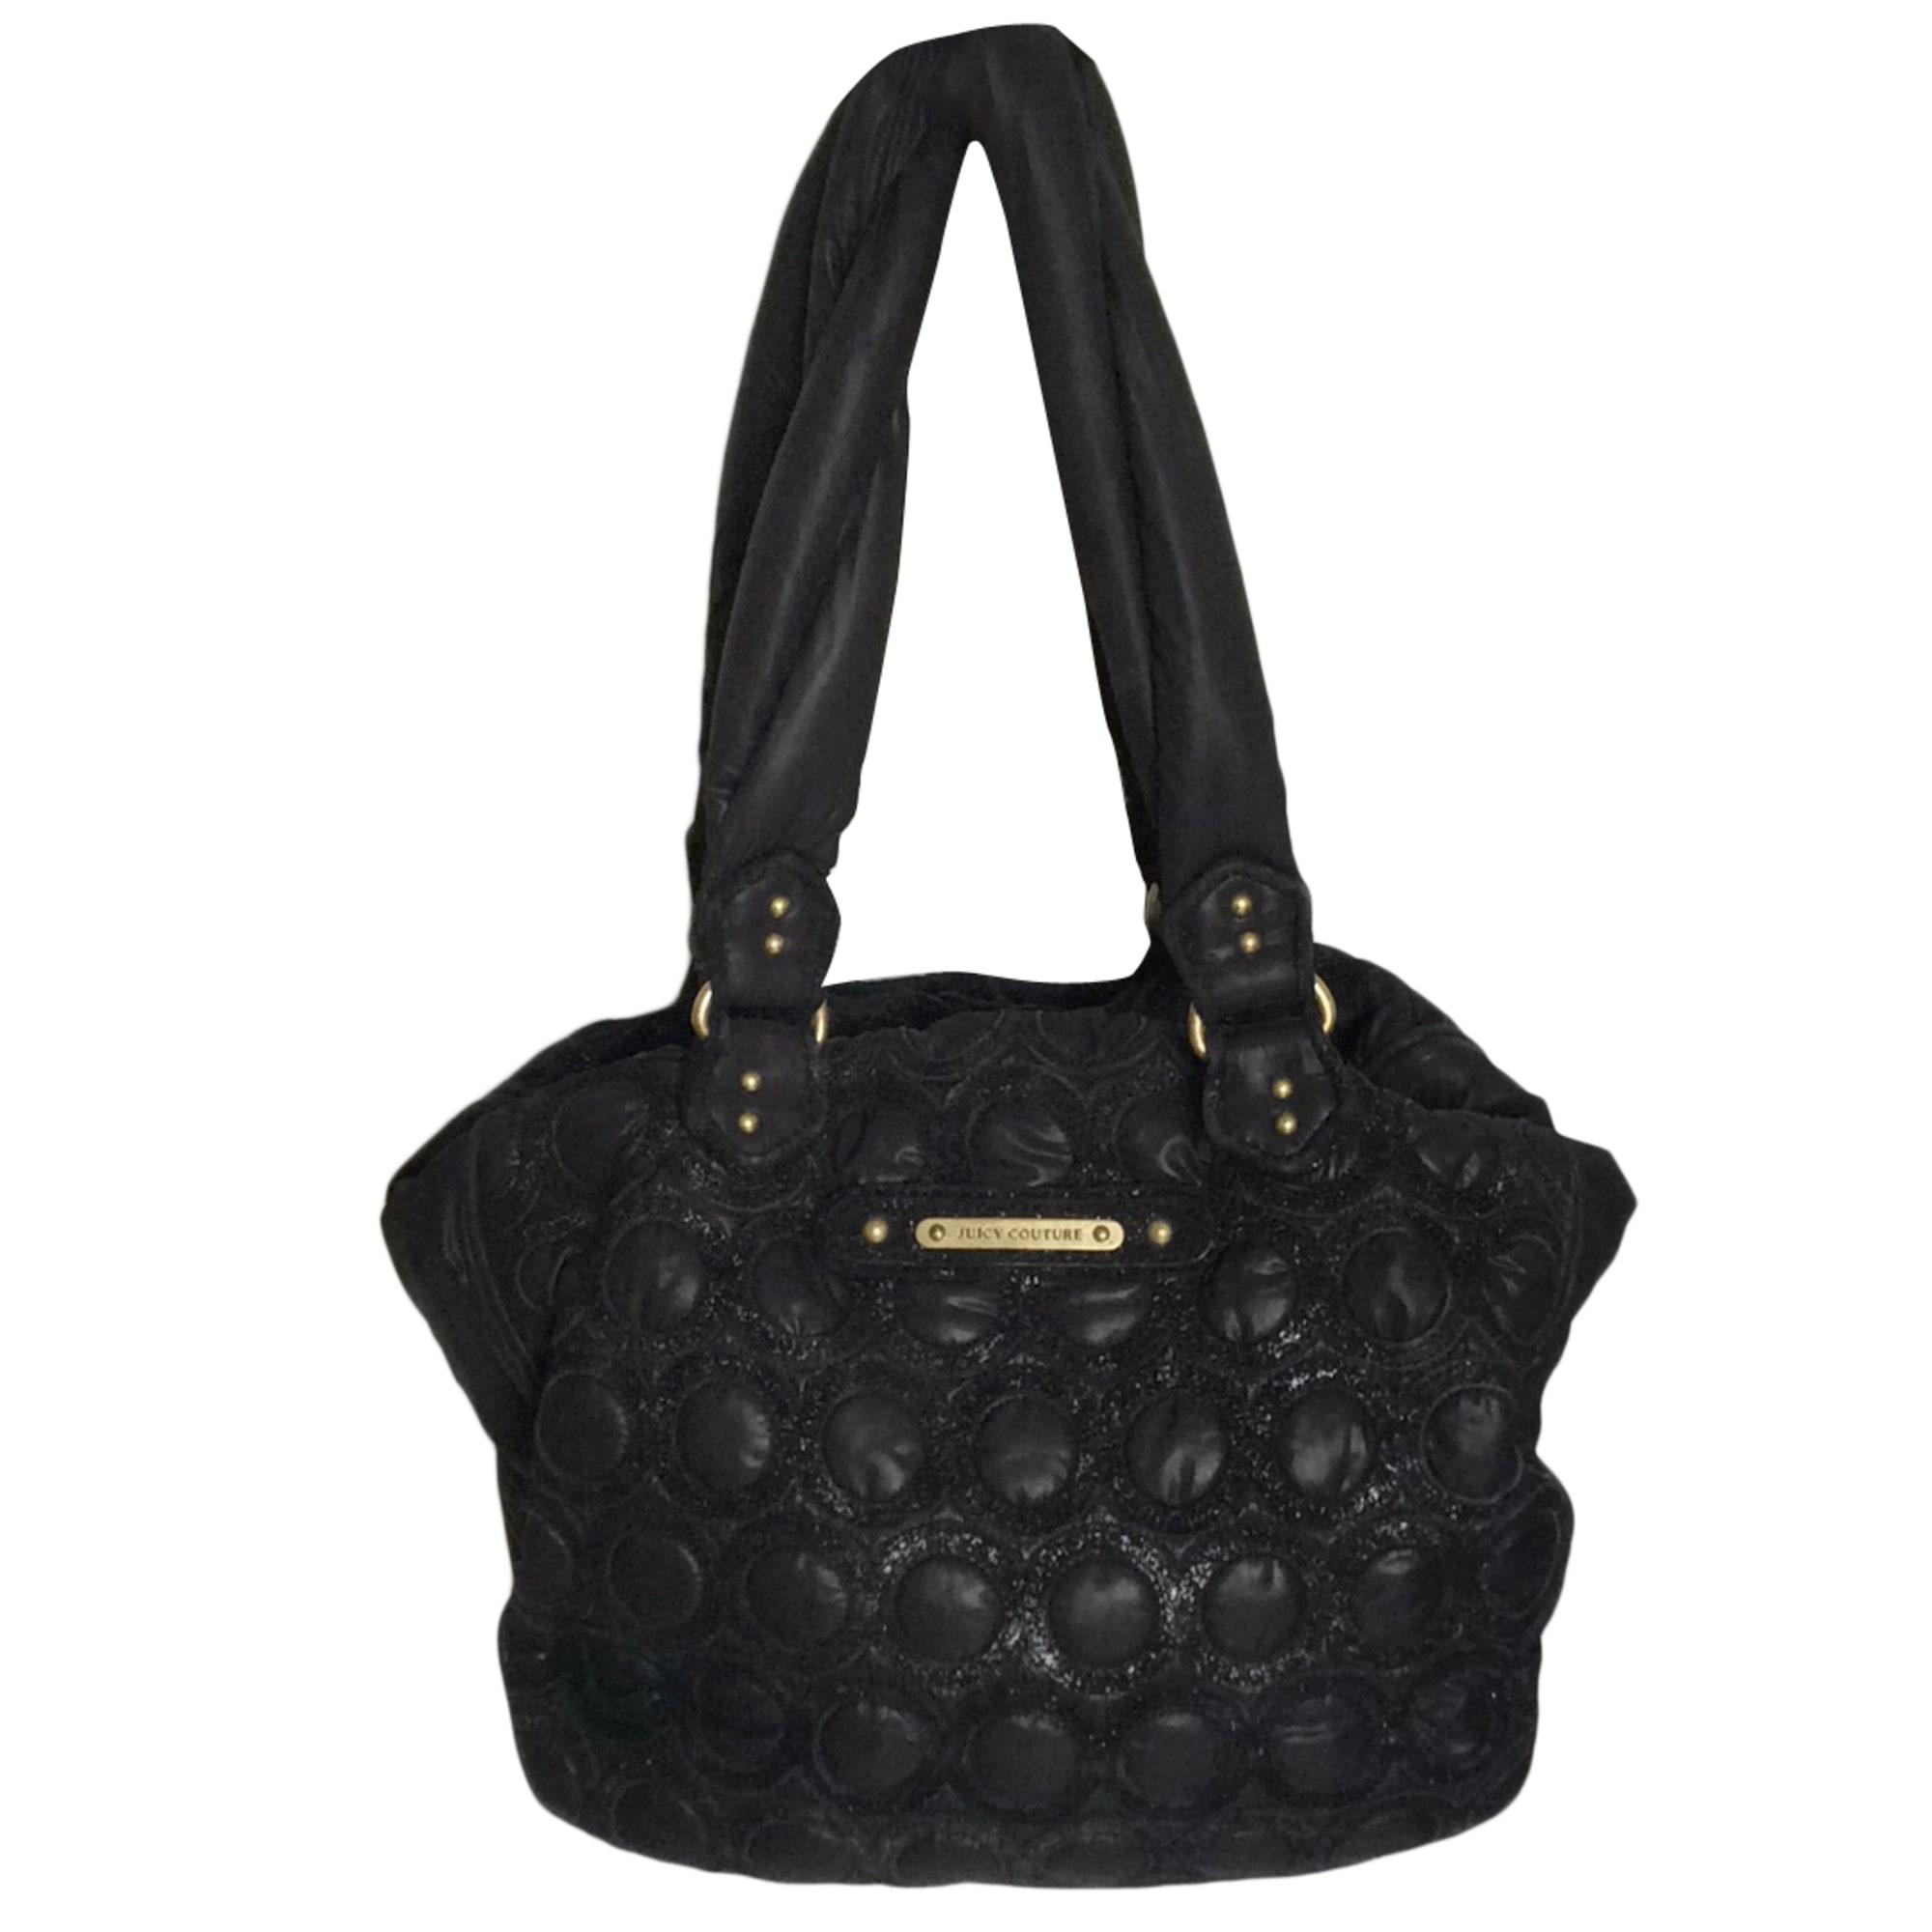 8e07eeb5b6 Sac XL en tissu JUICY COUTURE noir - 4712807